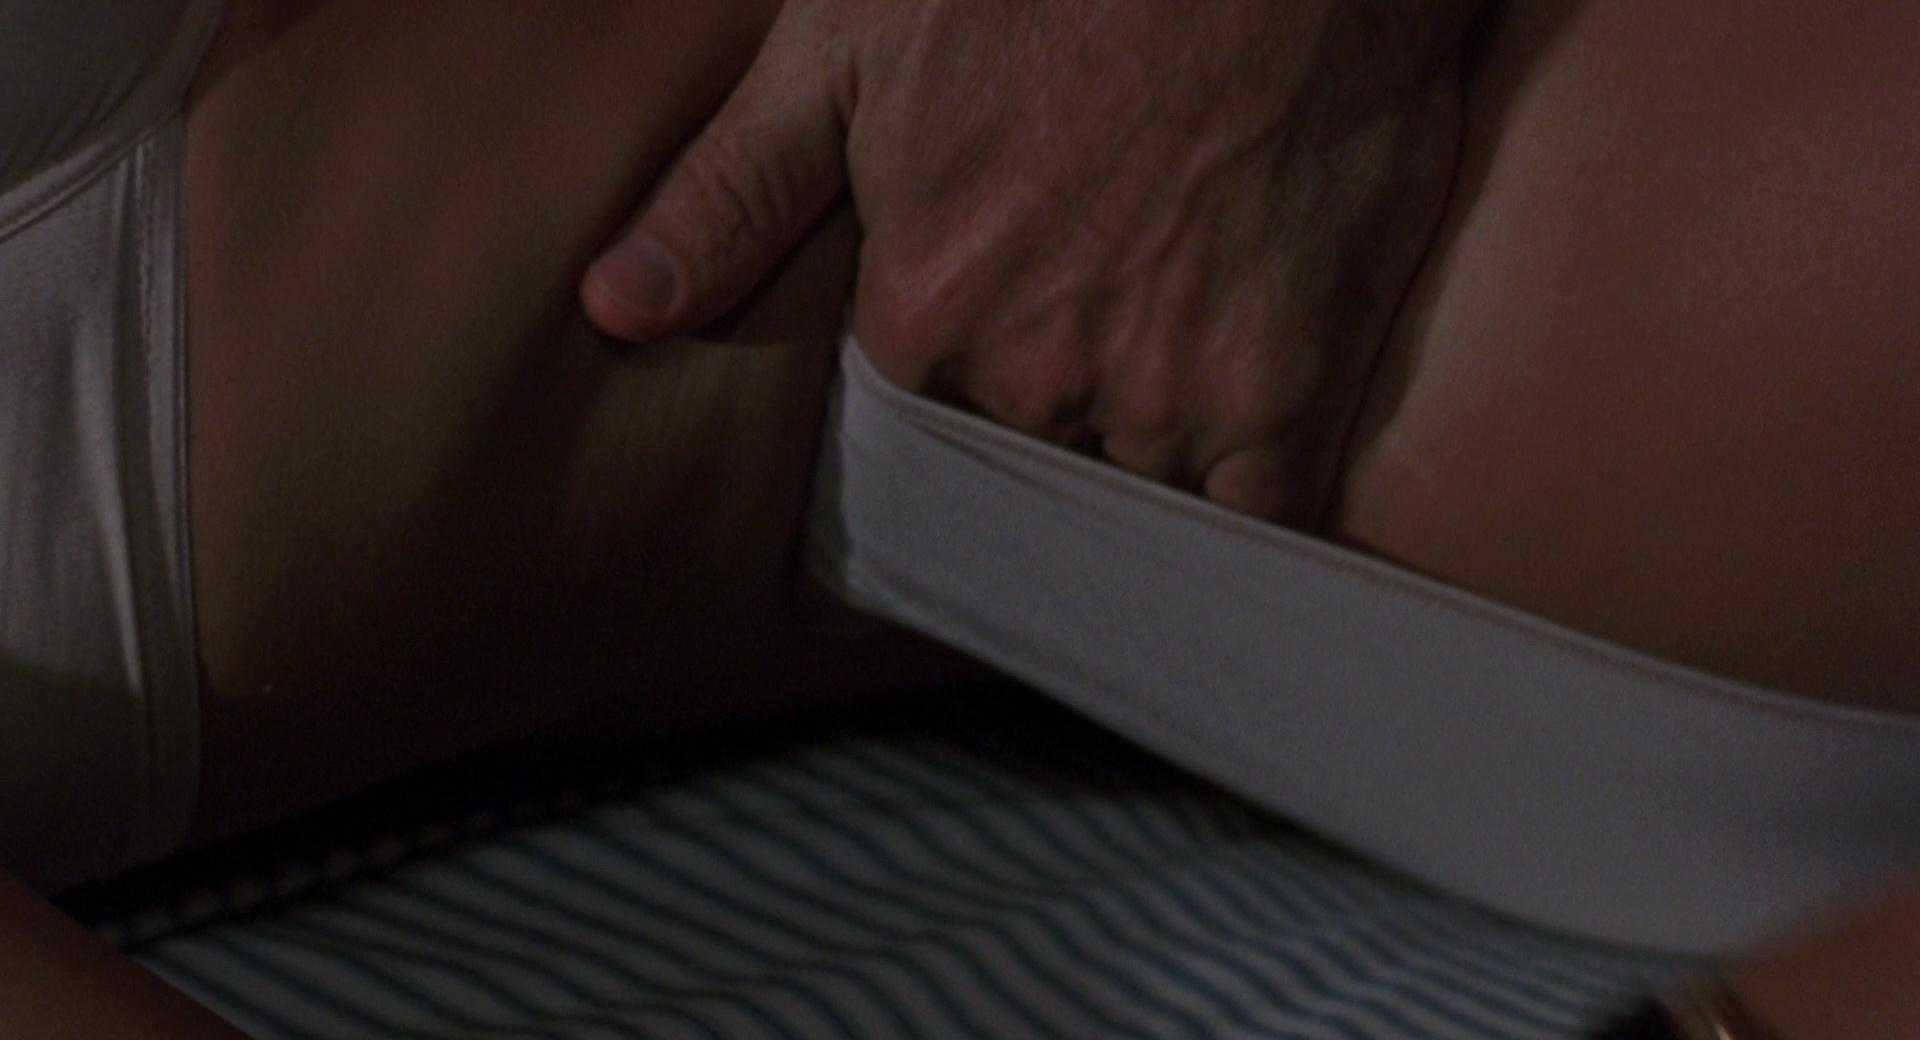 Striking distance sex scene